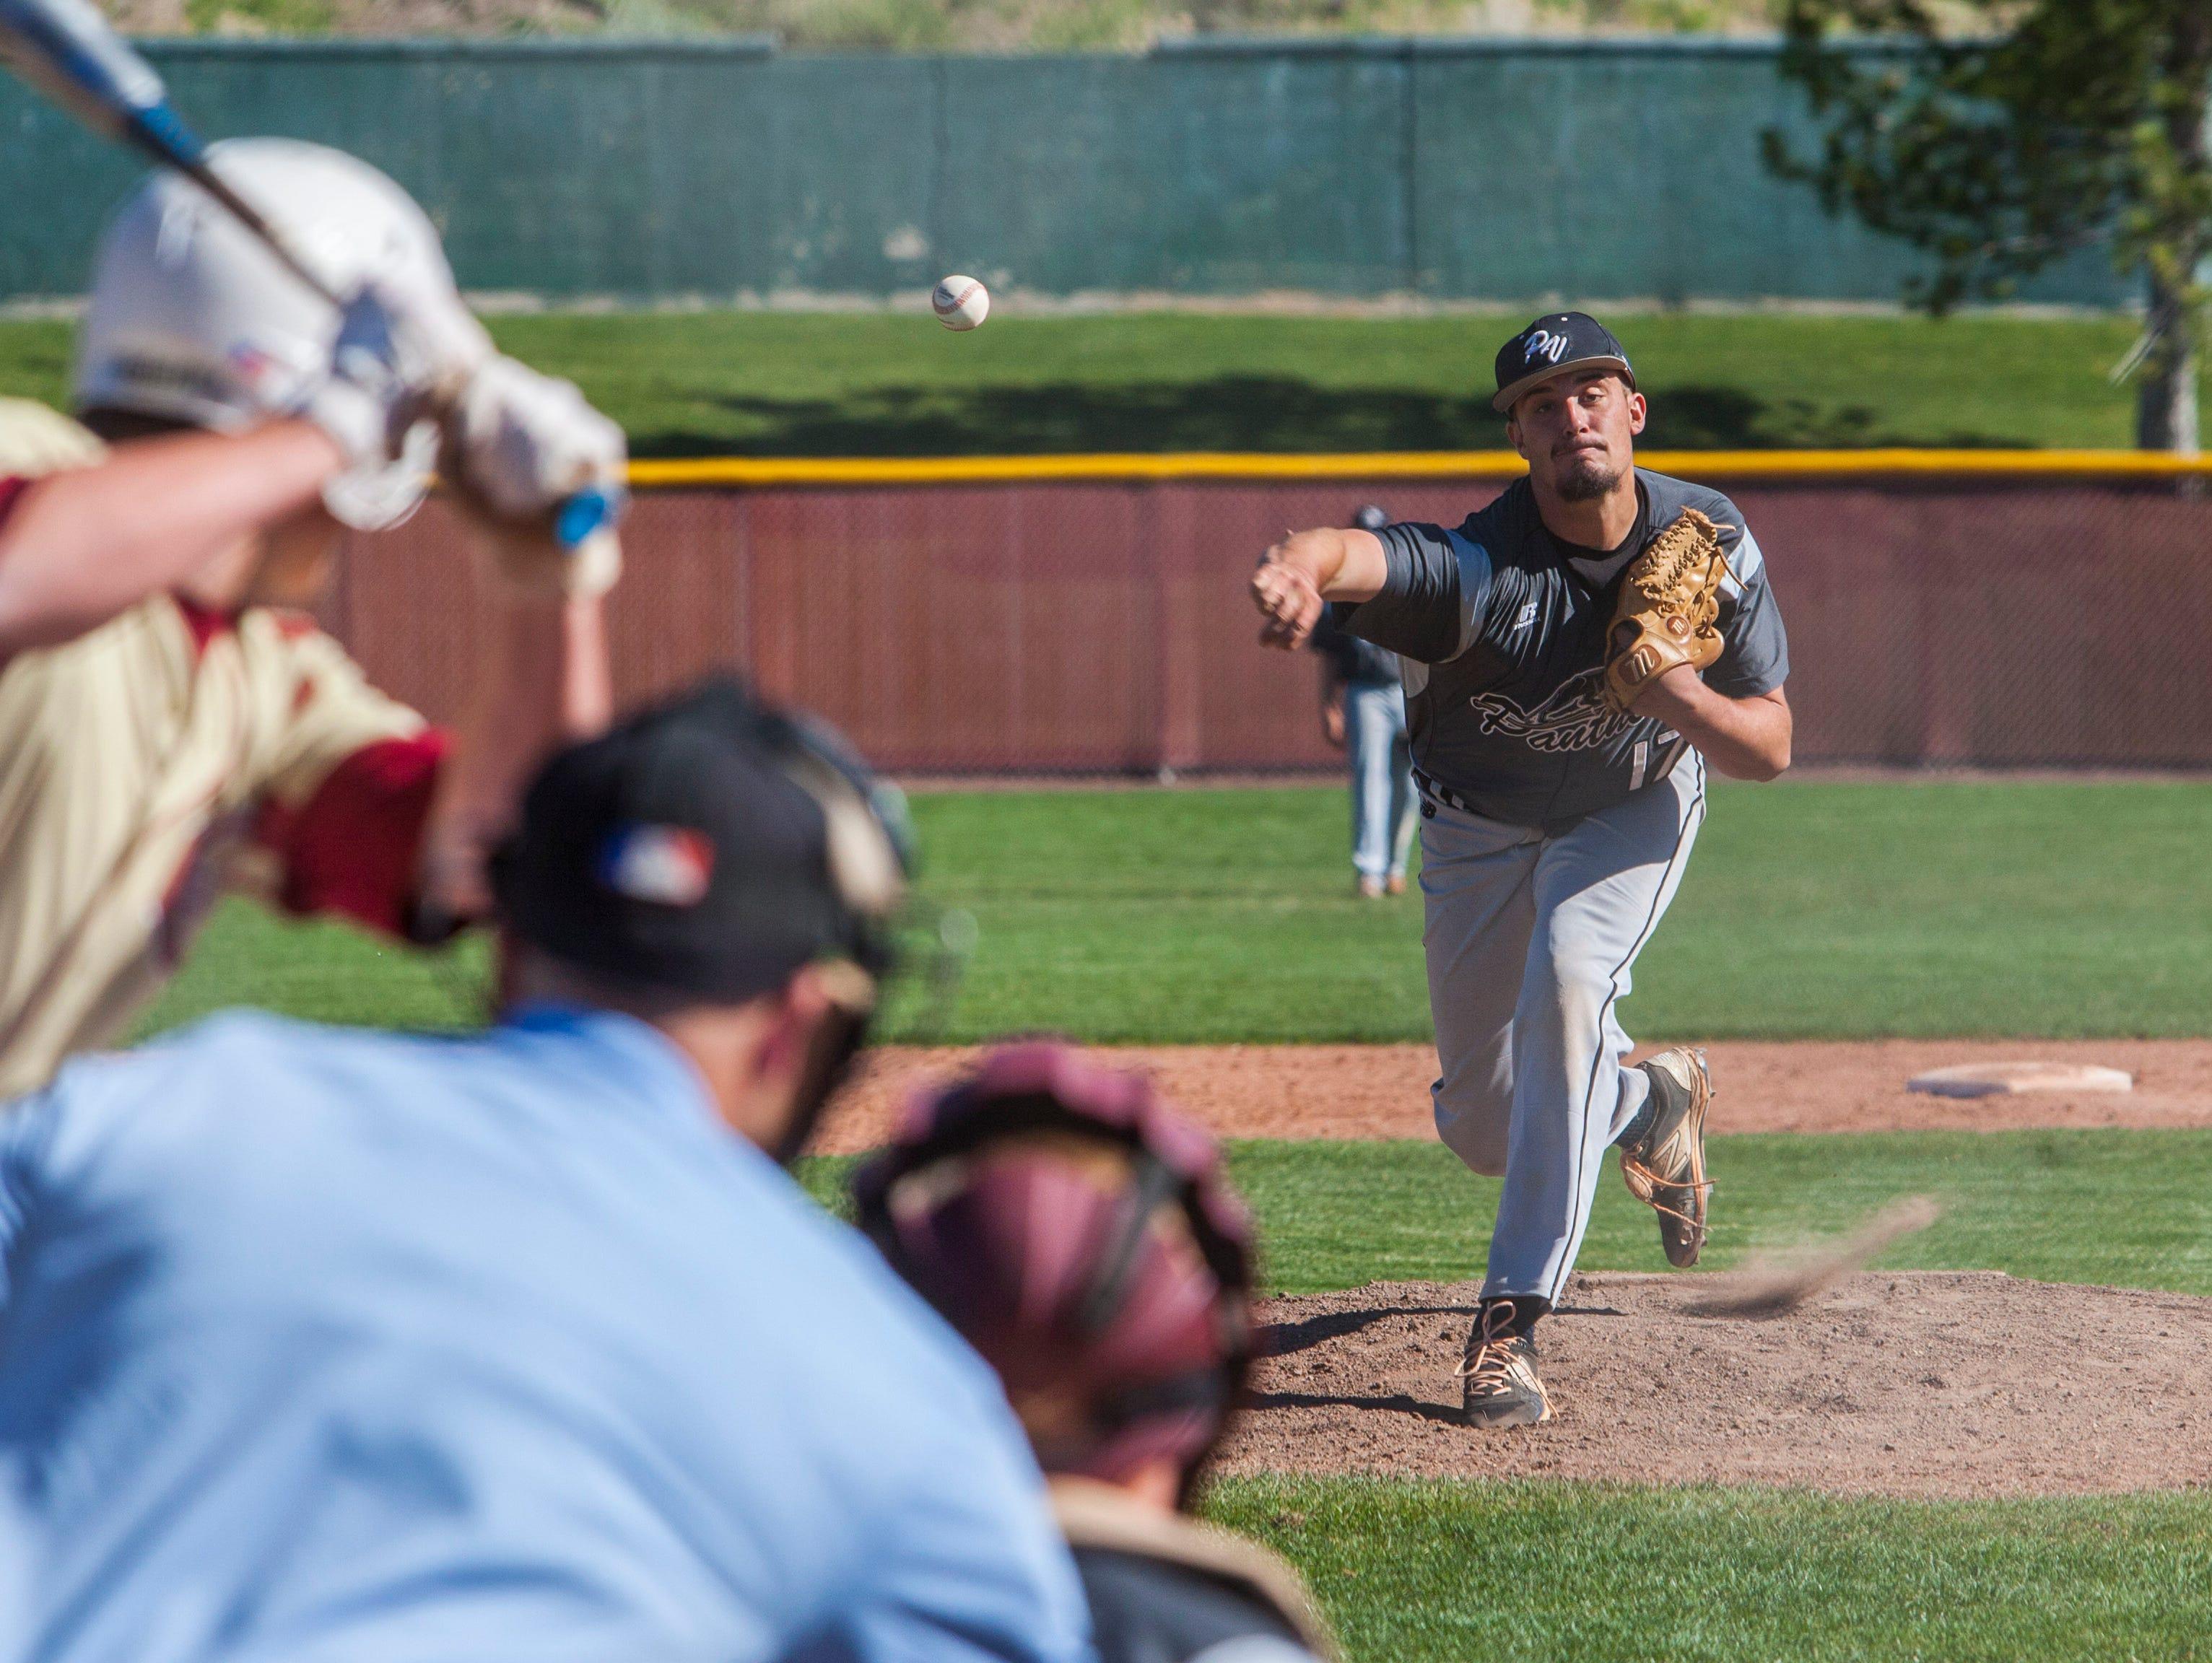 Pine View's Dakota Donovan throws a pitch during the game against Cedar, Tuesday, April 19, 2016.